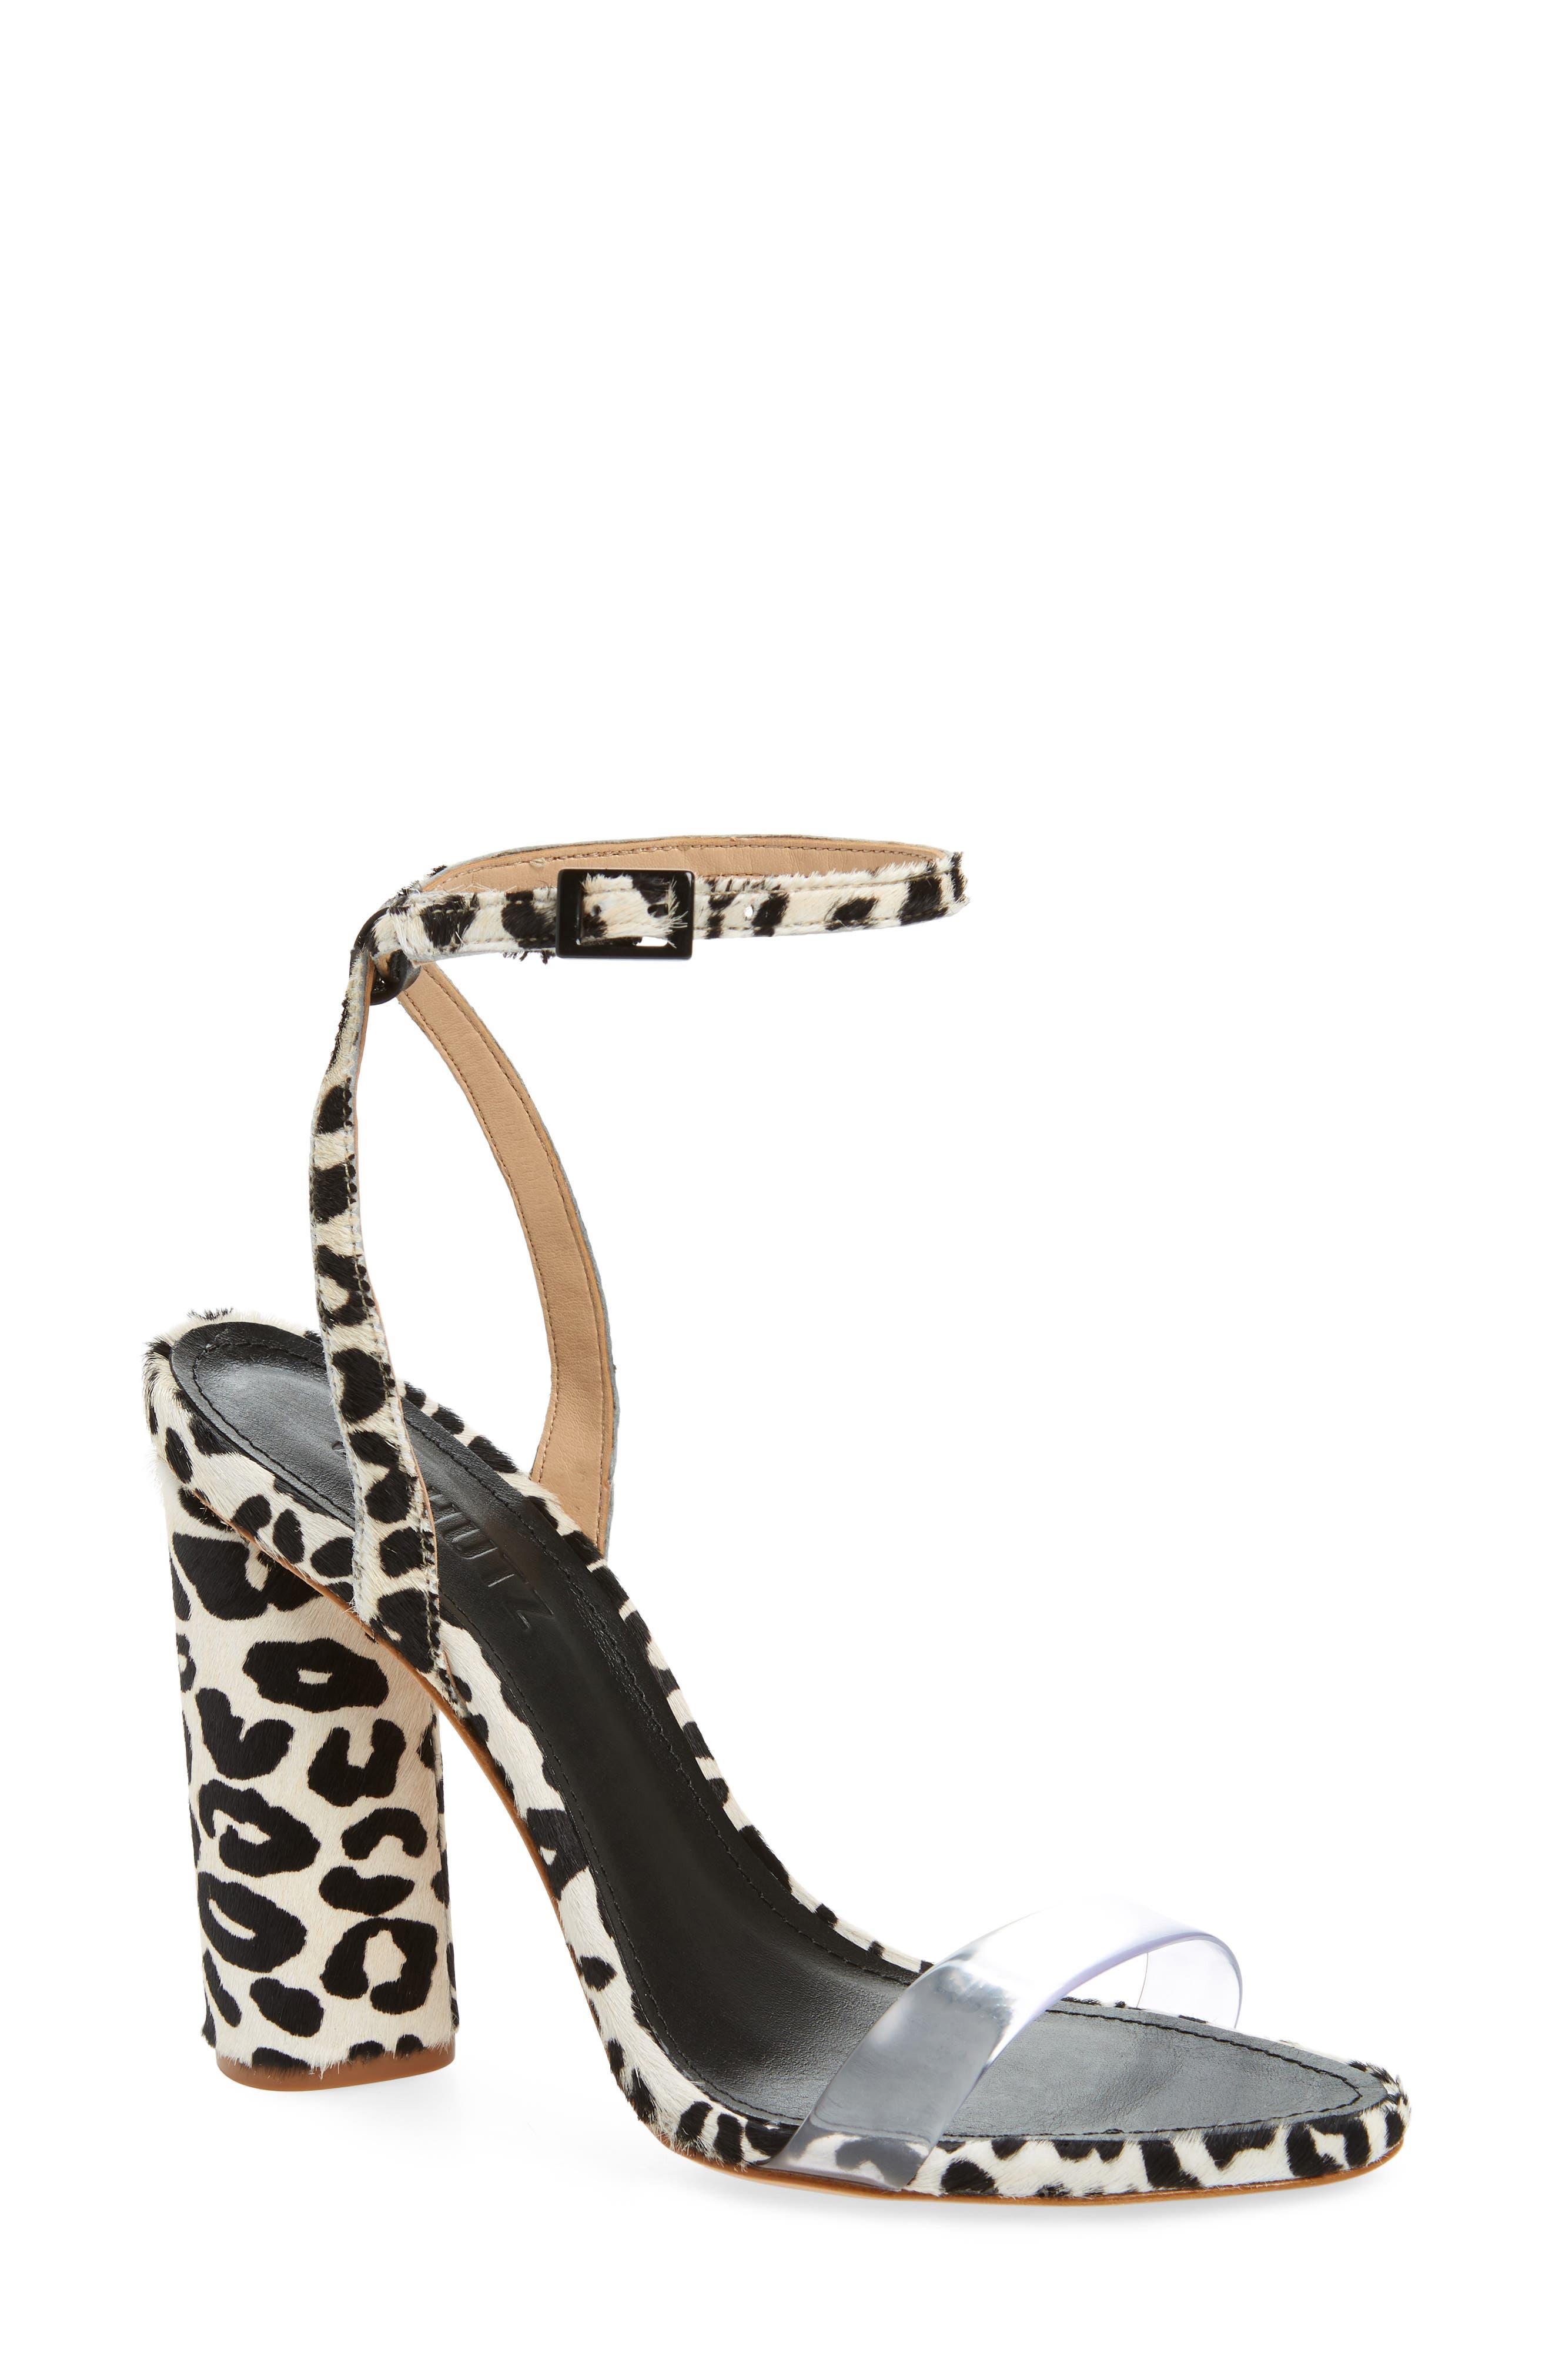 Elenita Genuine Calf Hair Sandal,                             Main thumbnail 1, color,                             PEARL CALF HAIR